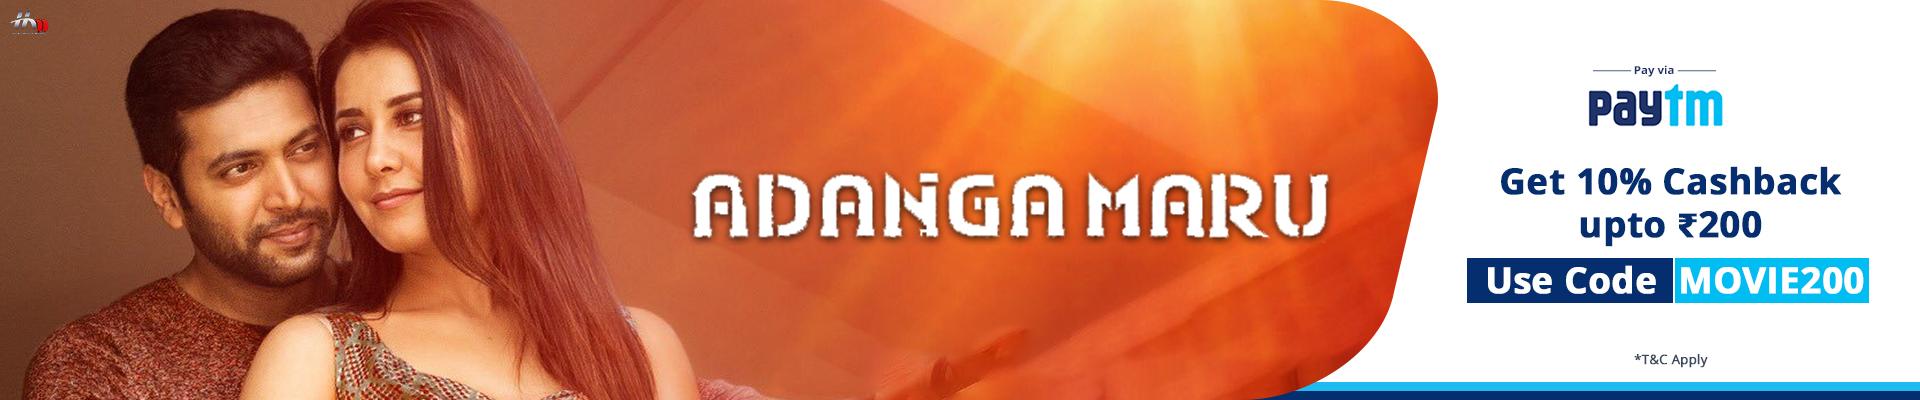 Adangamaru Tamil Banner